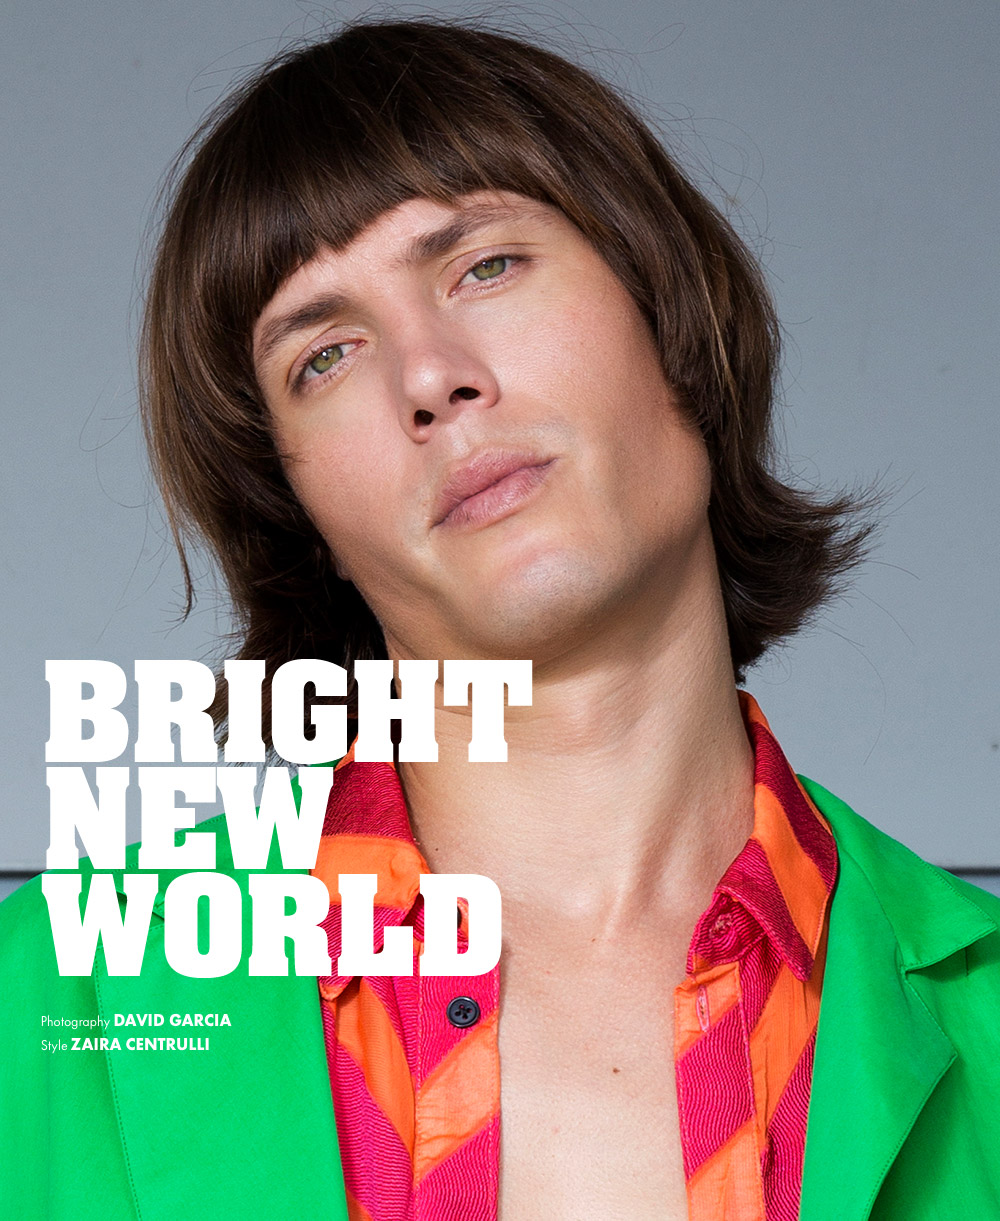 brightnewworld.jpg